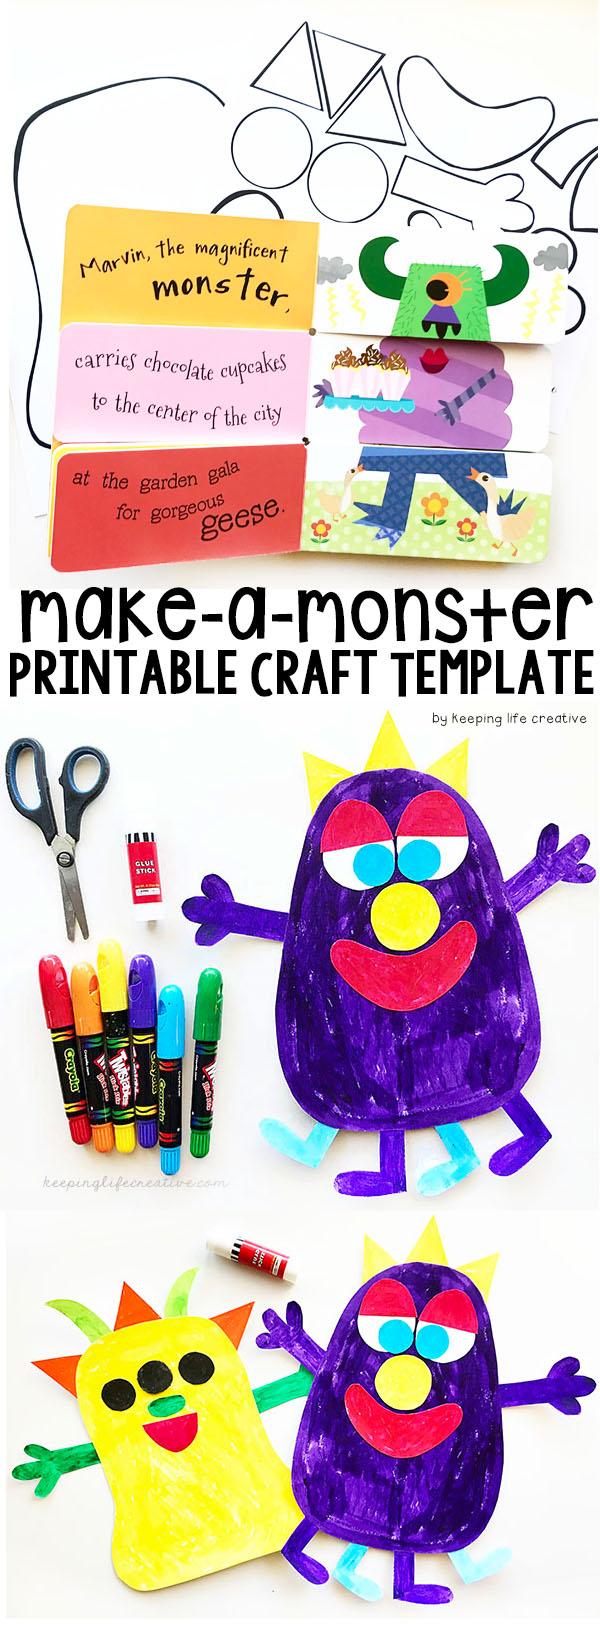 Make-a-Monster Printable Craft Template